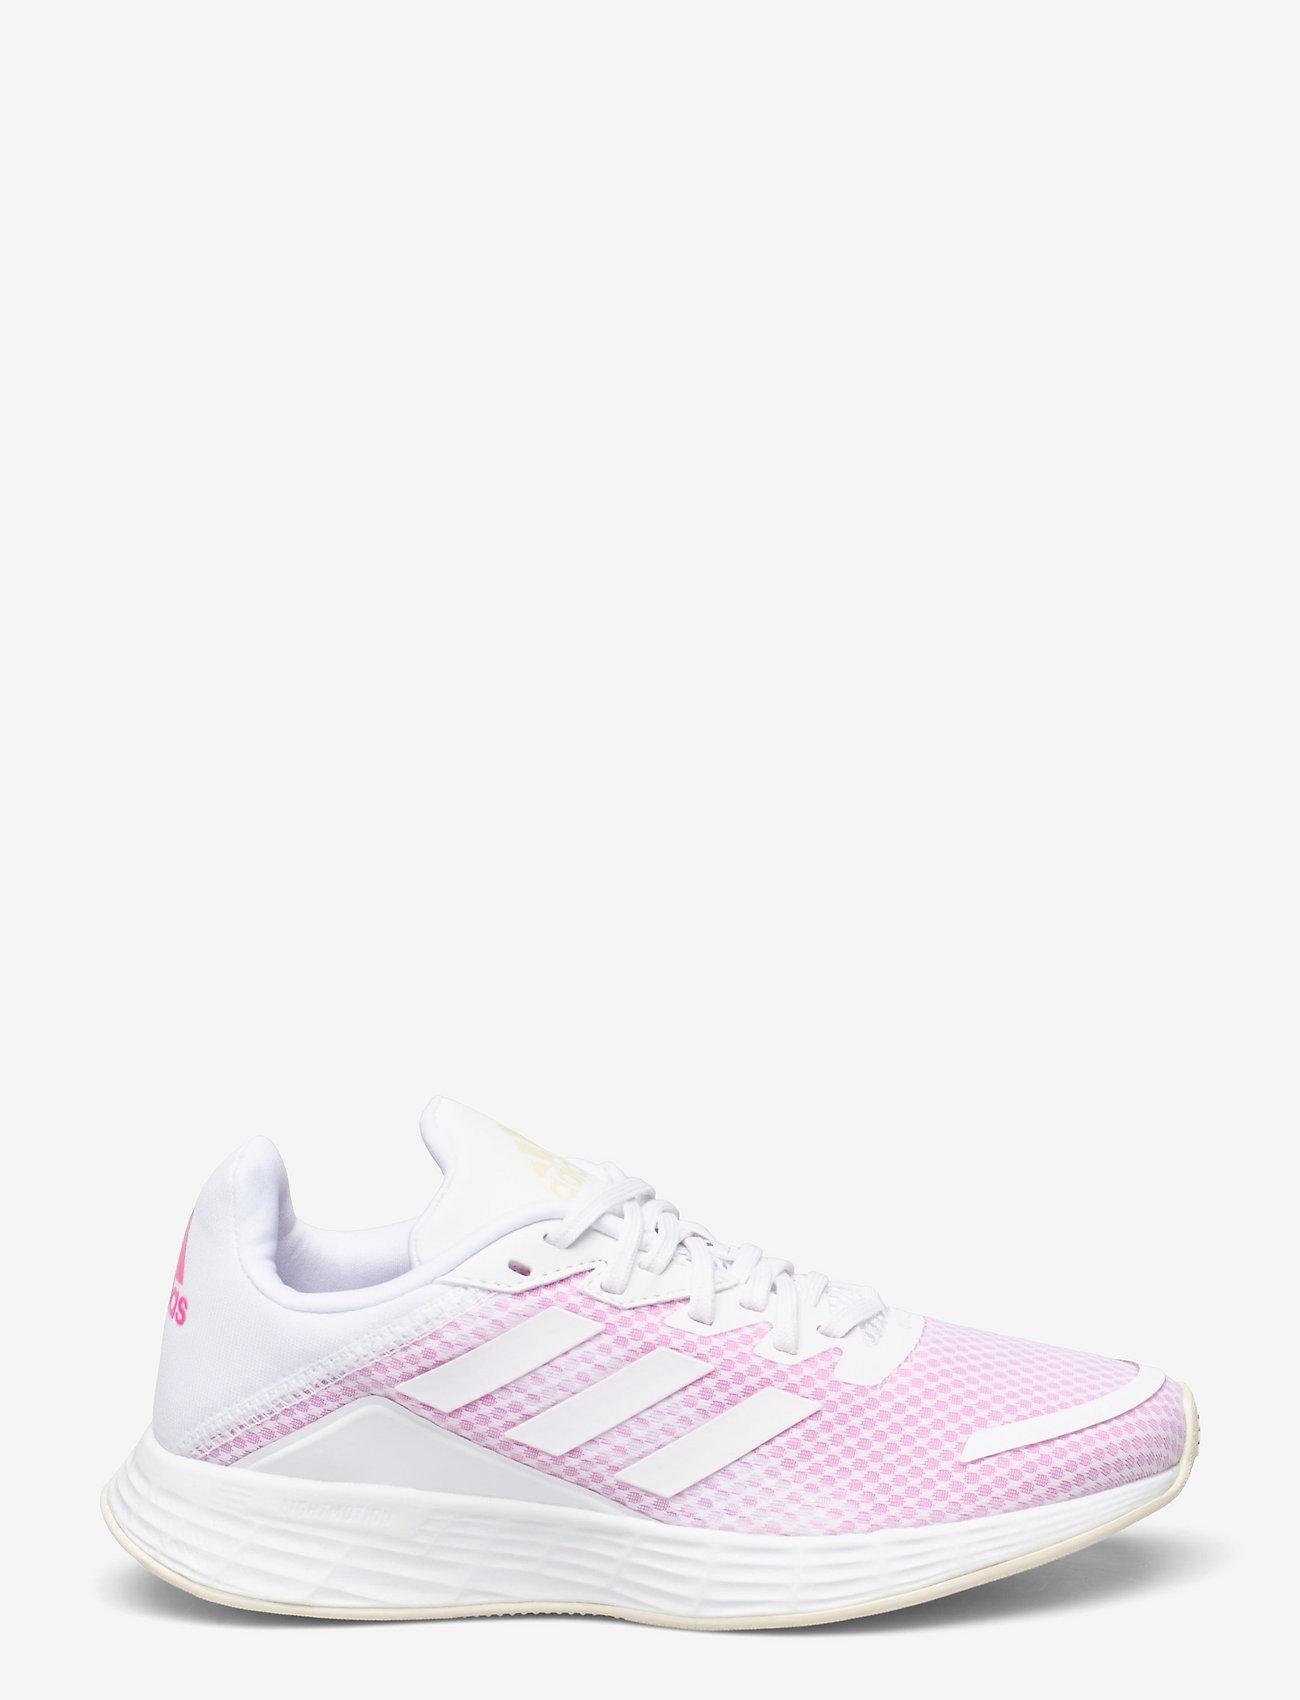 adidas Performance - Duramo SL  W - running shoes - ftwwht/ftwwht/scrpnk - 1